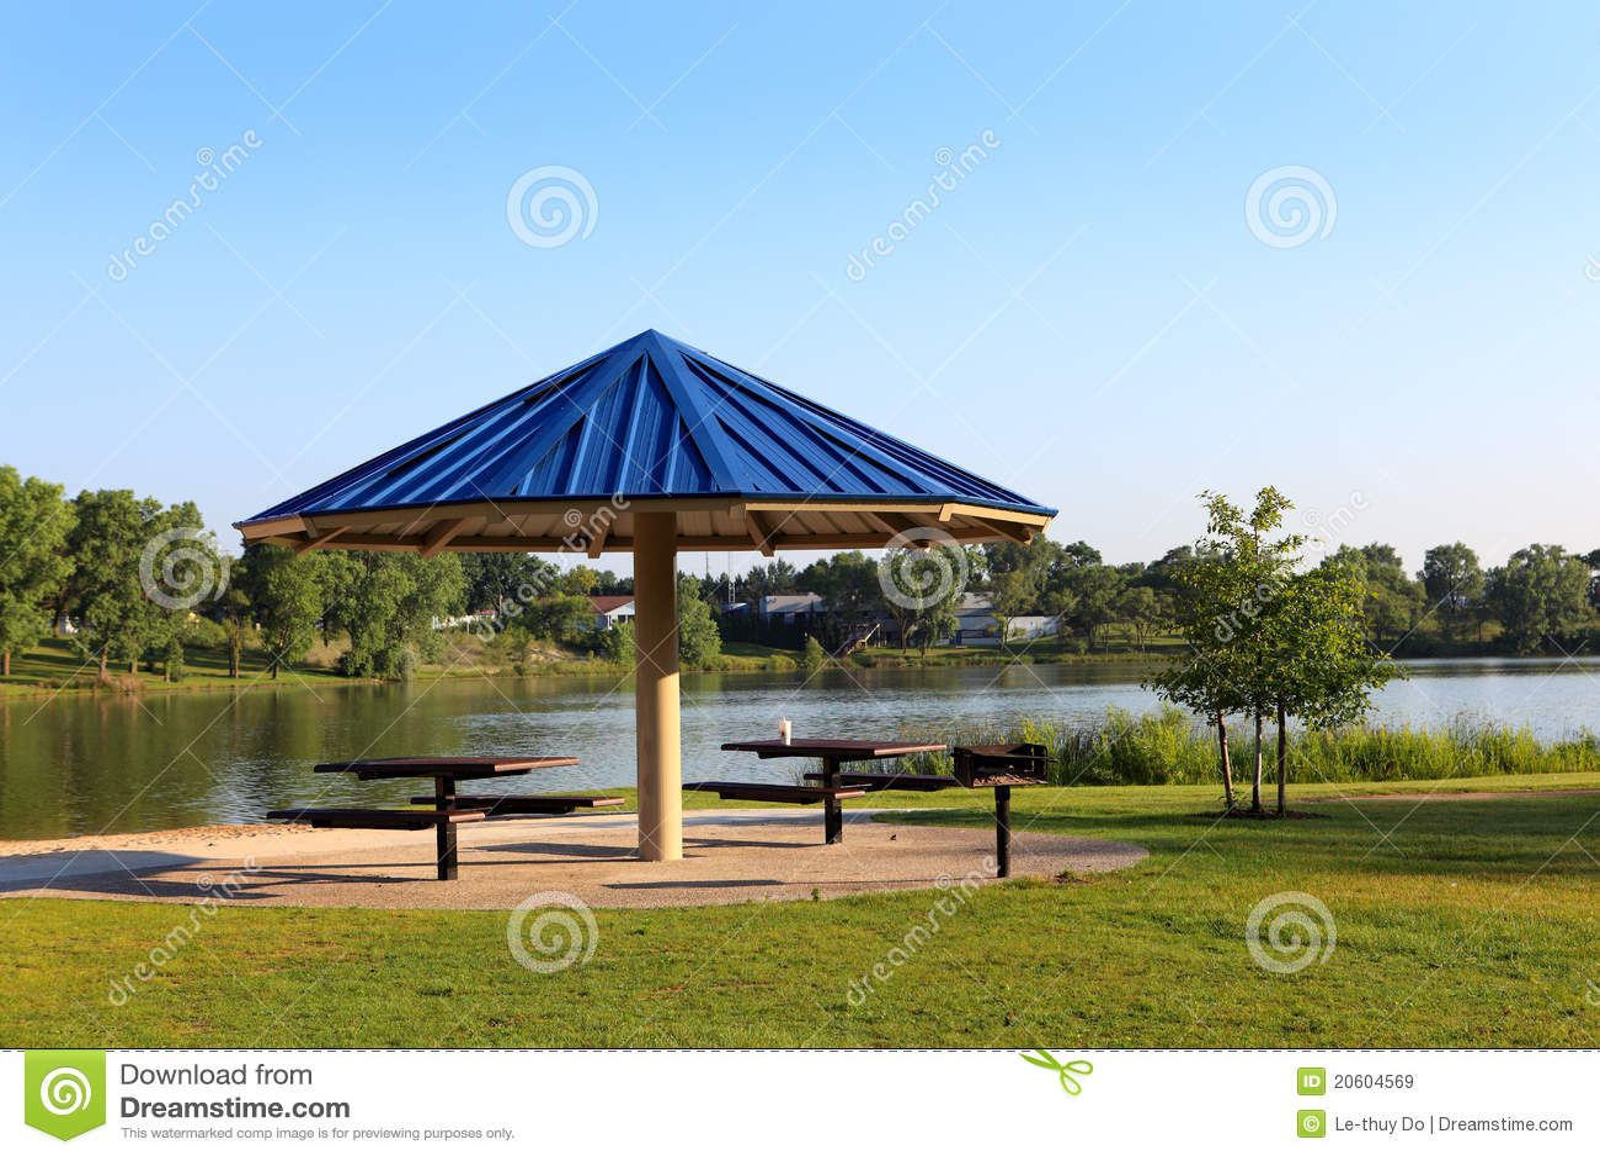 Gazebo Umbrella